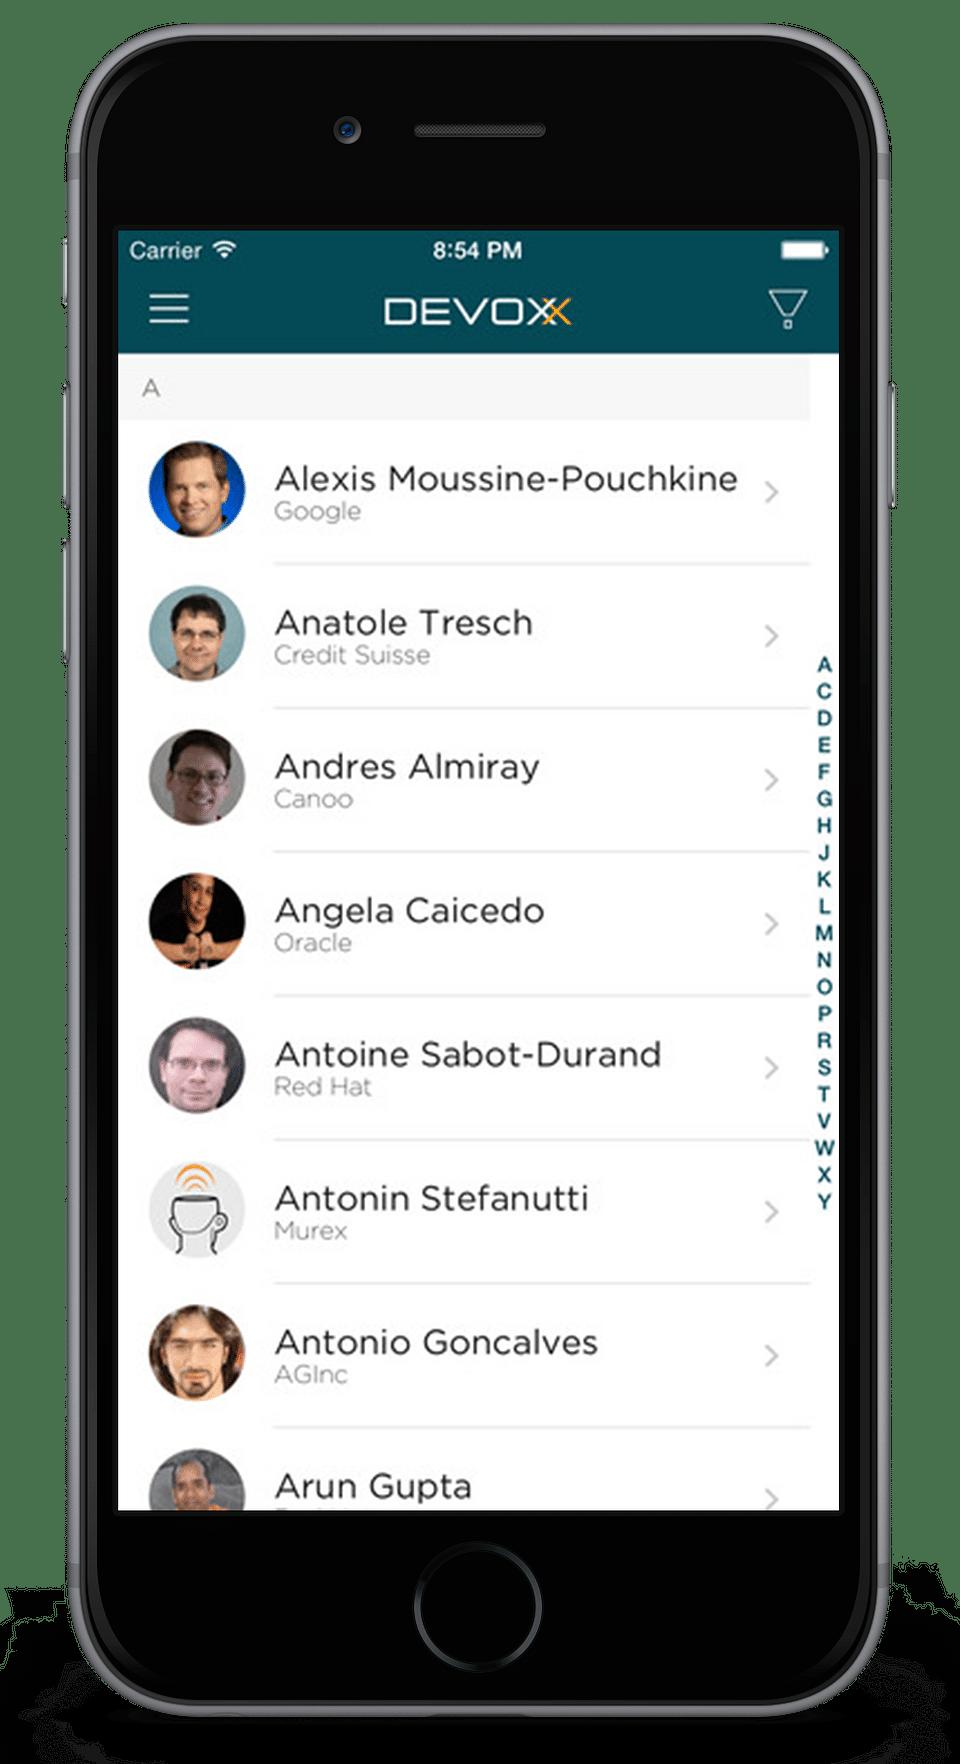 Event app for Devoxx Conference